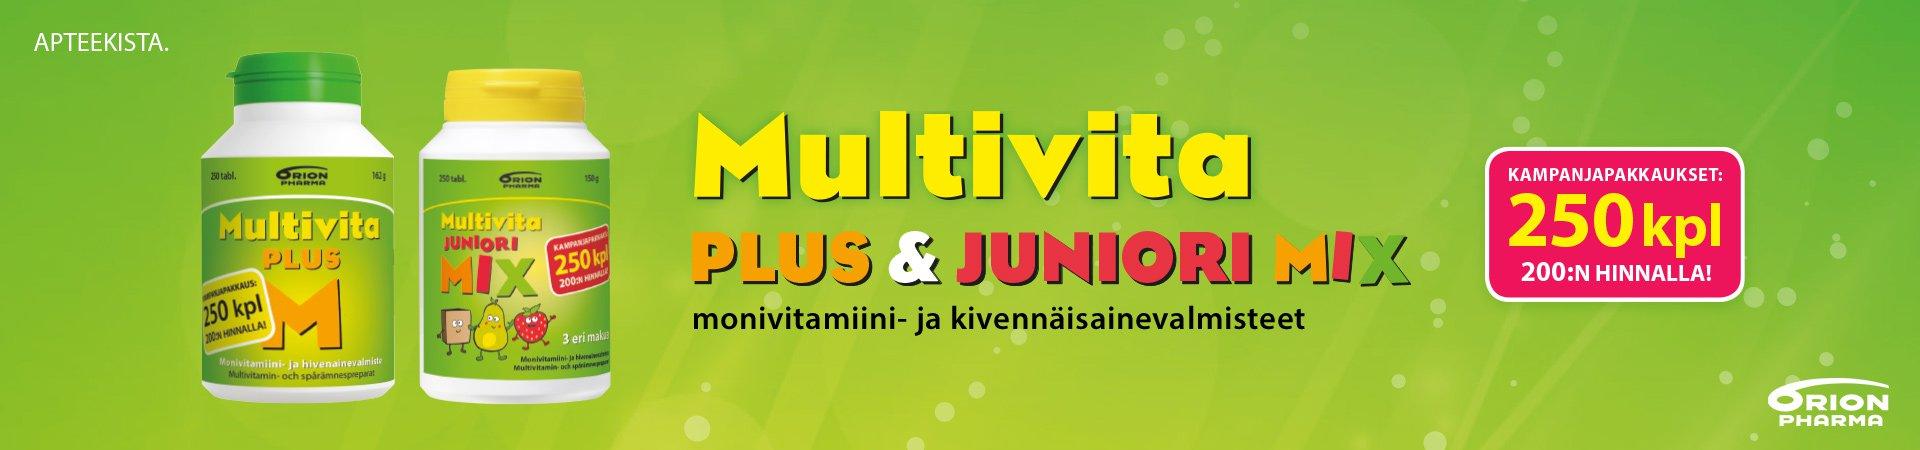 Multivita kampanjapakkaus 250 tabl.